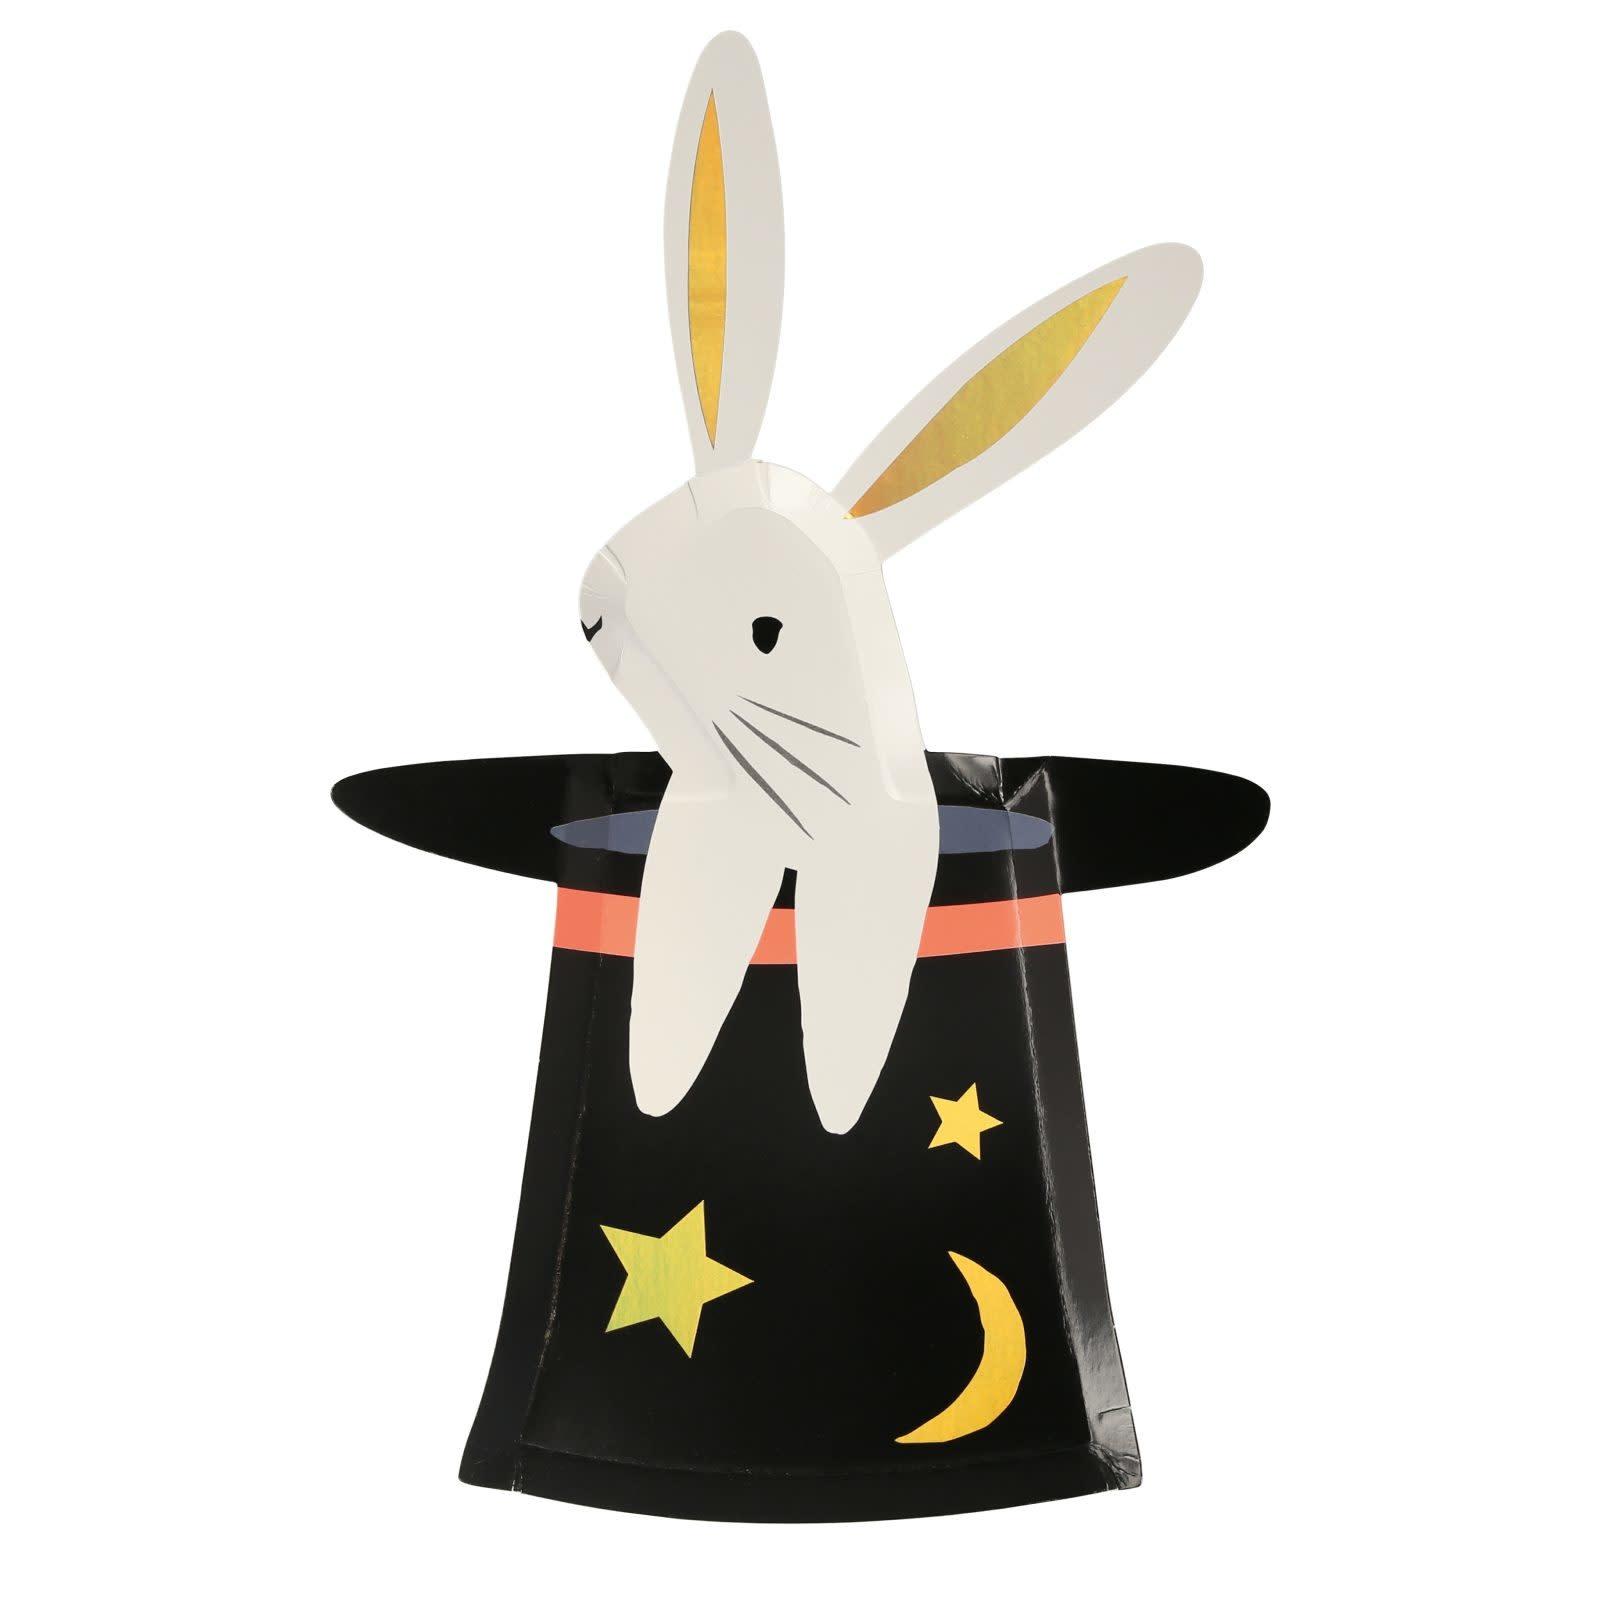 MERIMERI Bunny in hat shaped plates